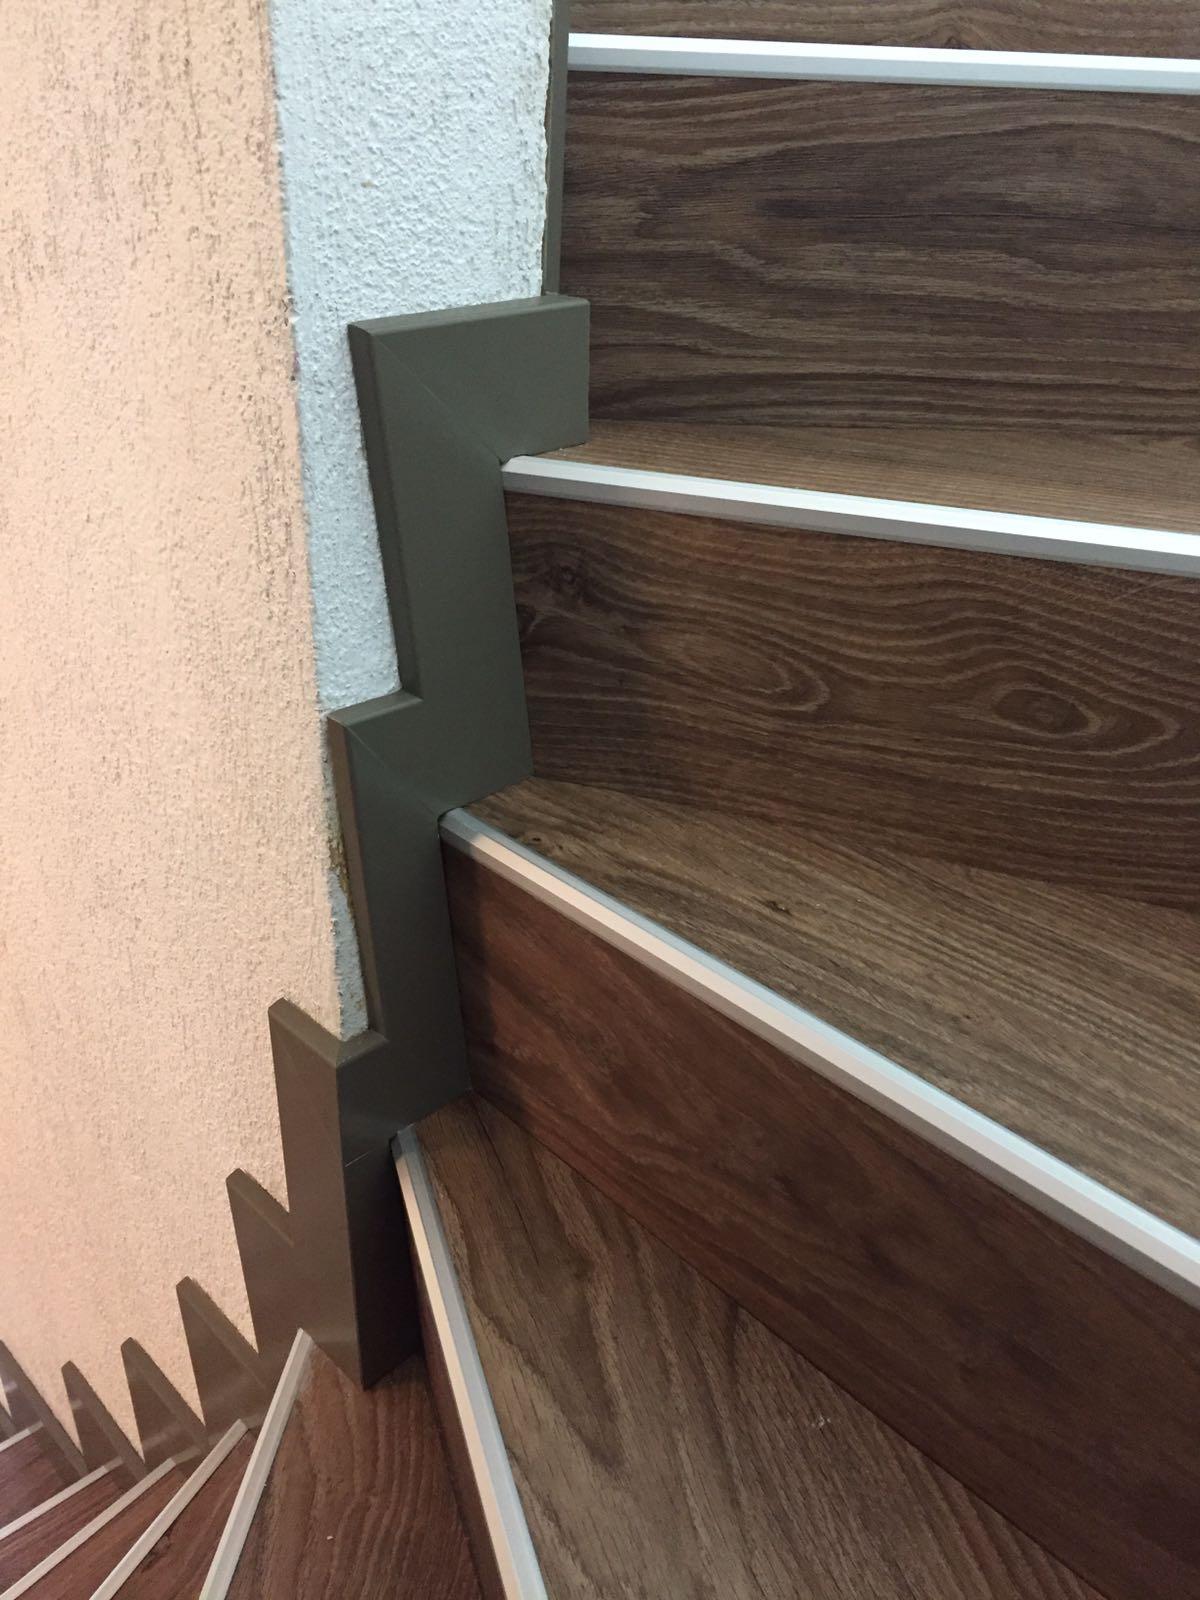 Farbig 60/10 mm auf Runde Treppe